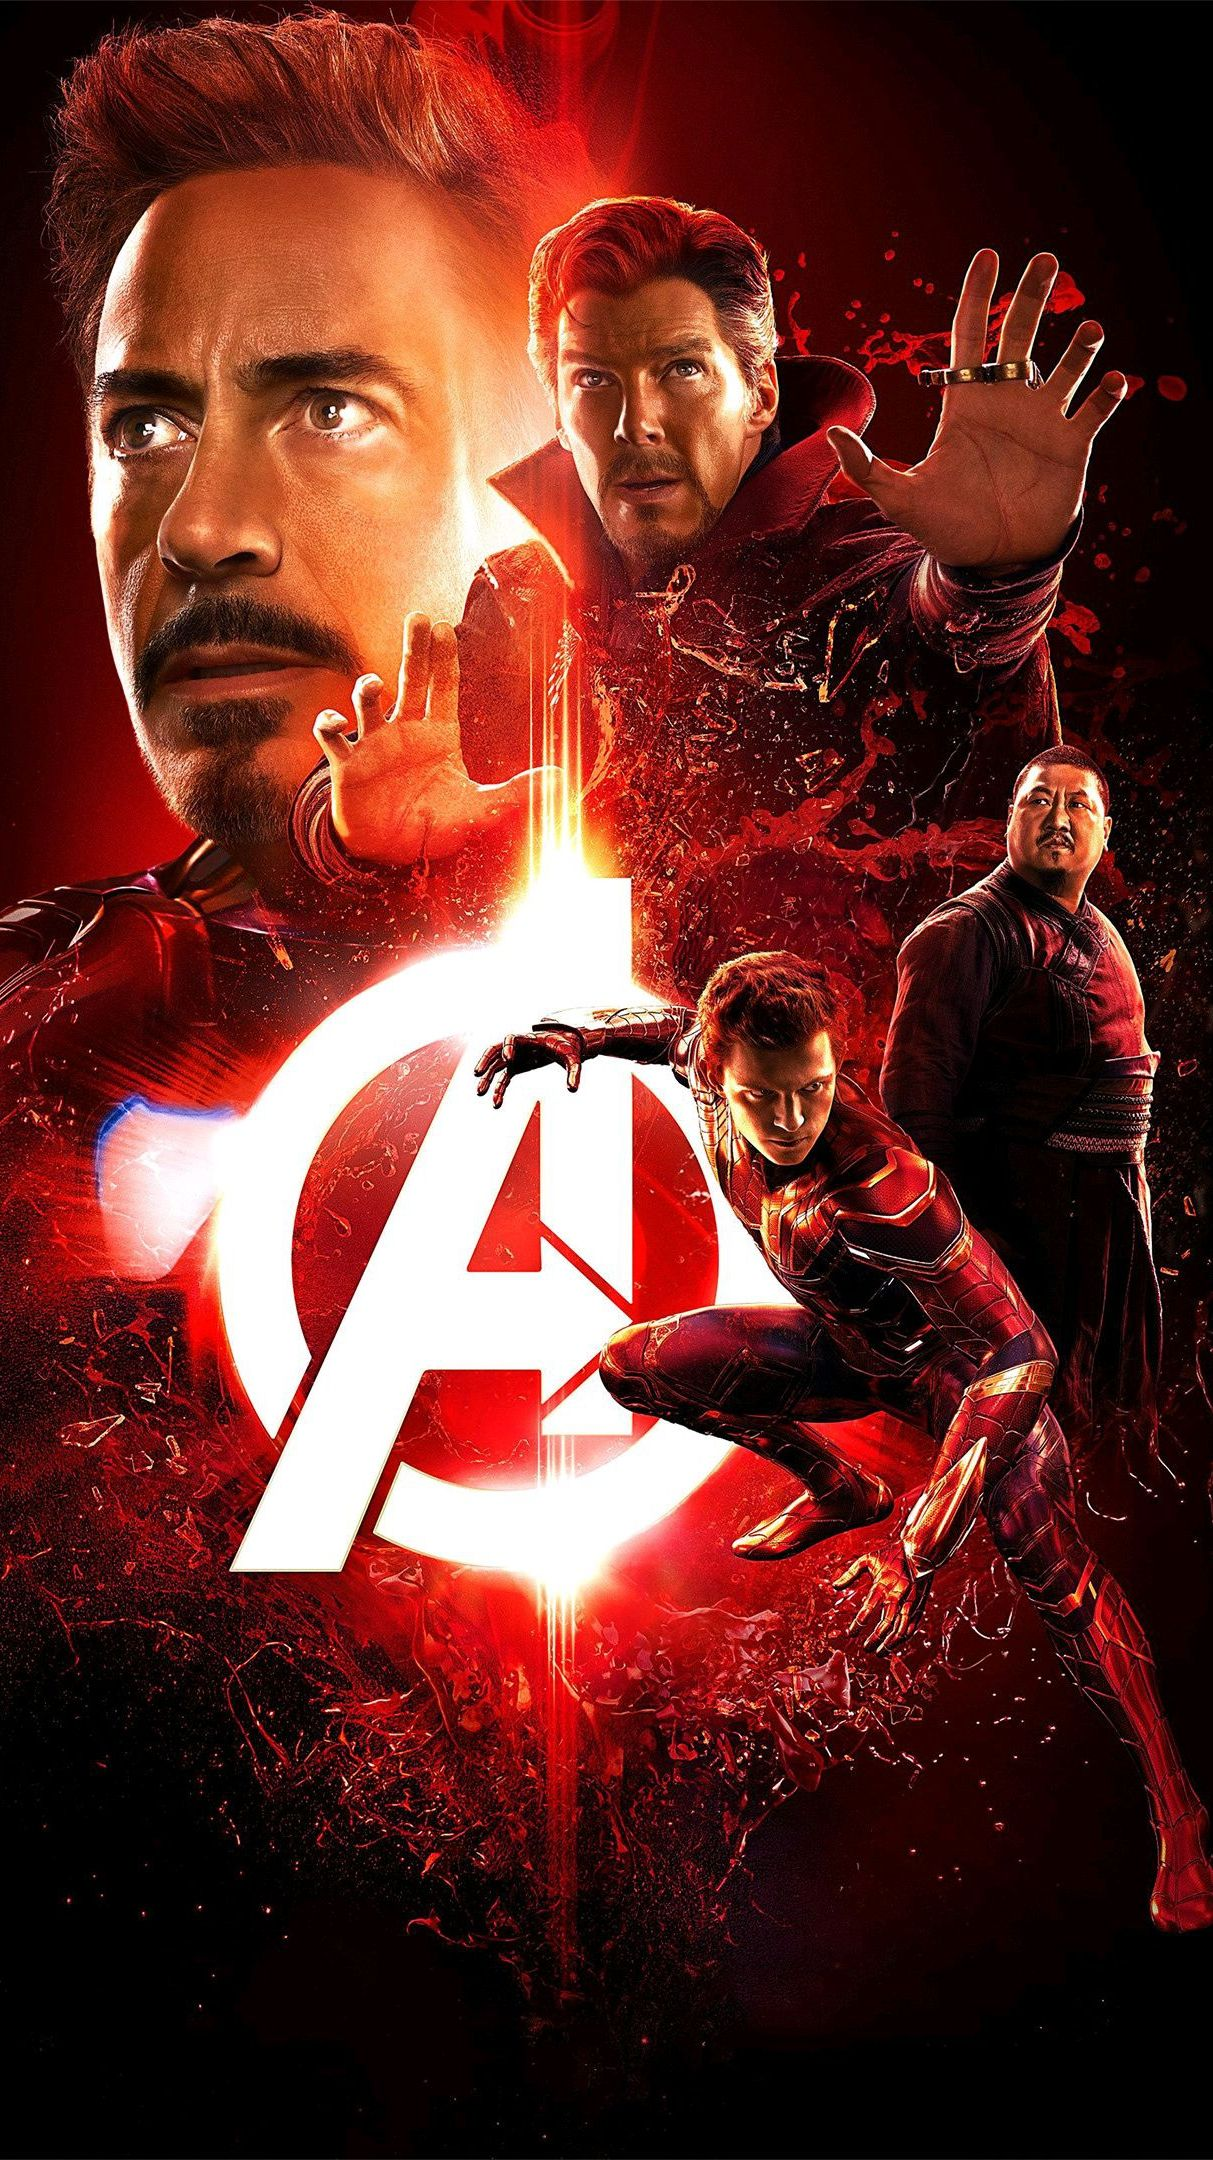 Avengers Infinity War Iron Man Spider Man Doctor Strange Iphone Wallpaper Iron Man Avengers Avengers Poster Marvel Iron Man